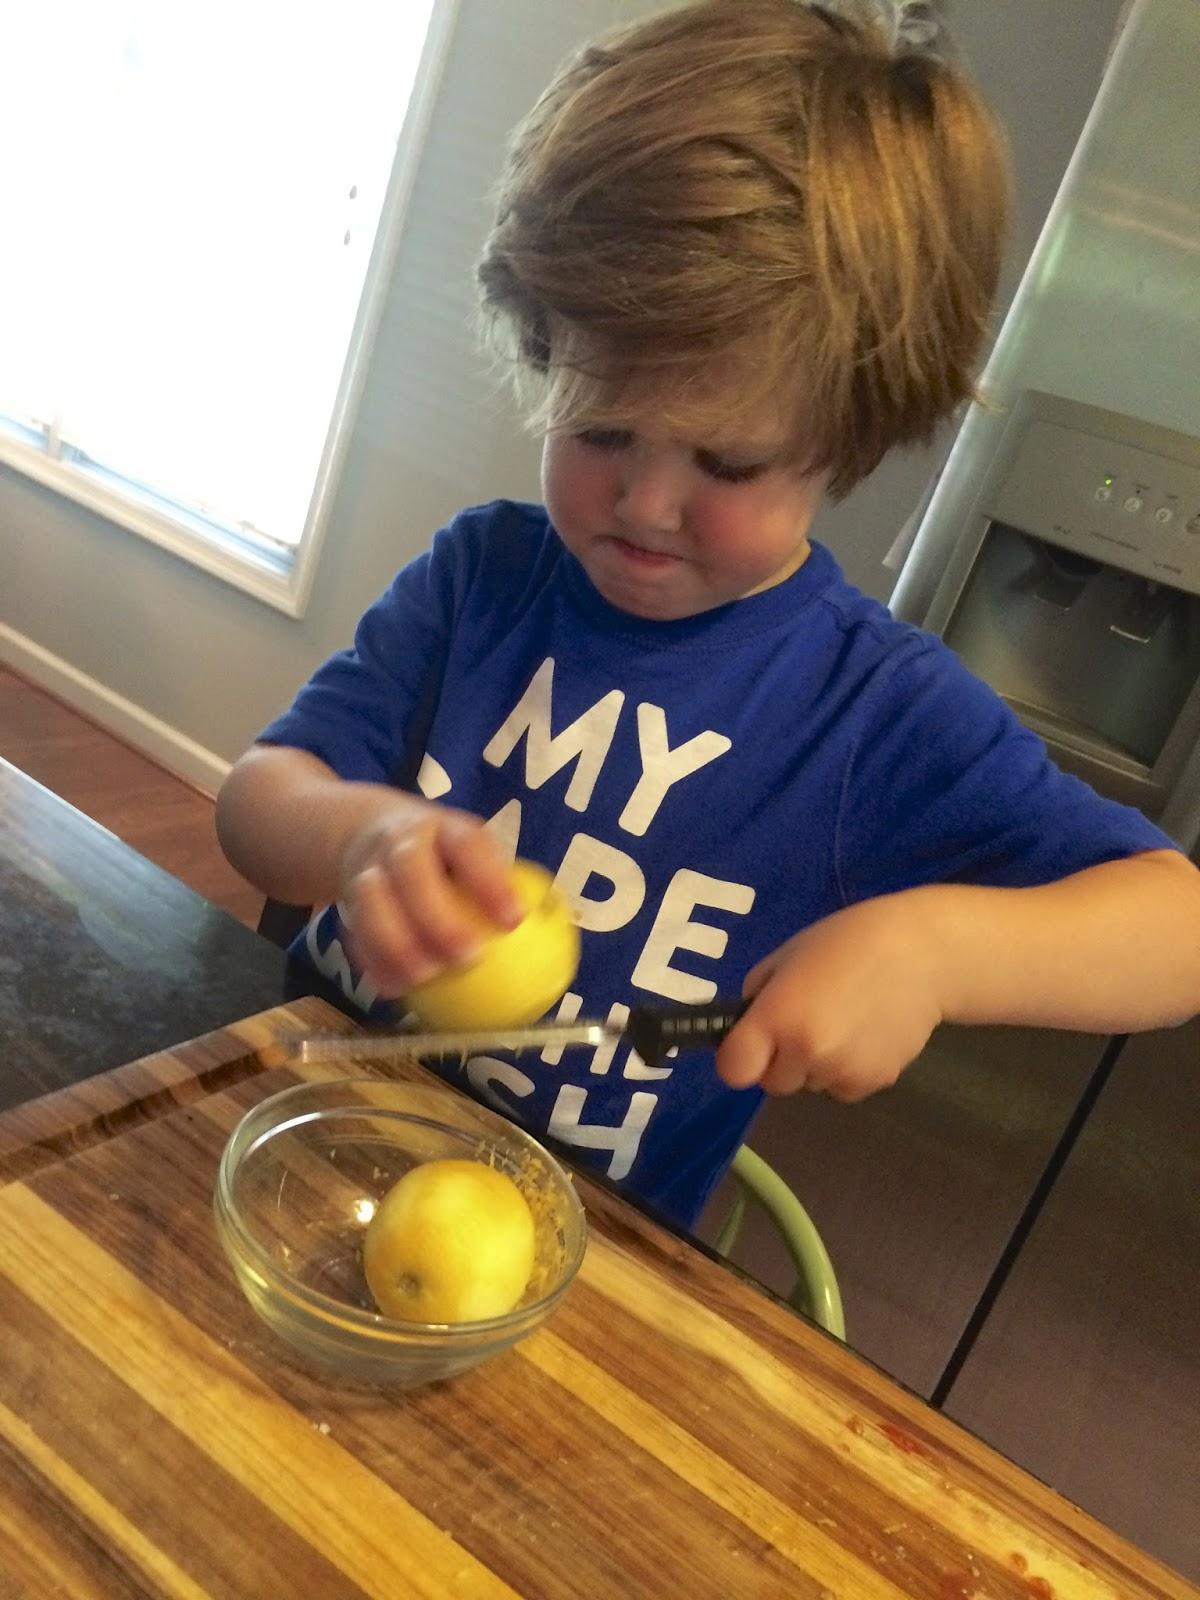 Boy Zests Lemon